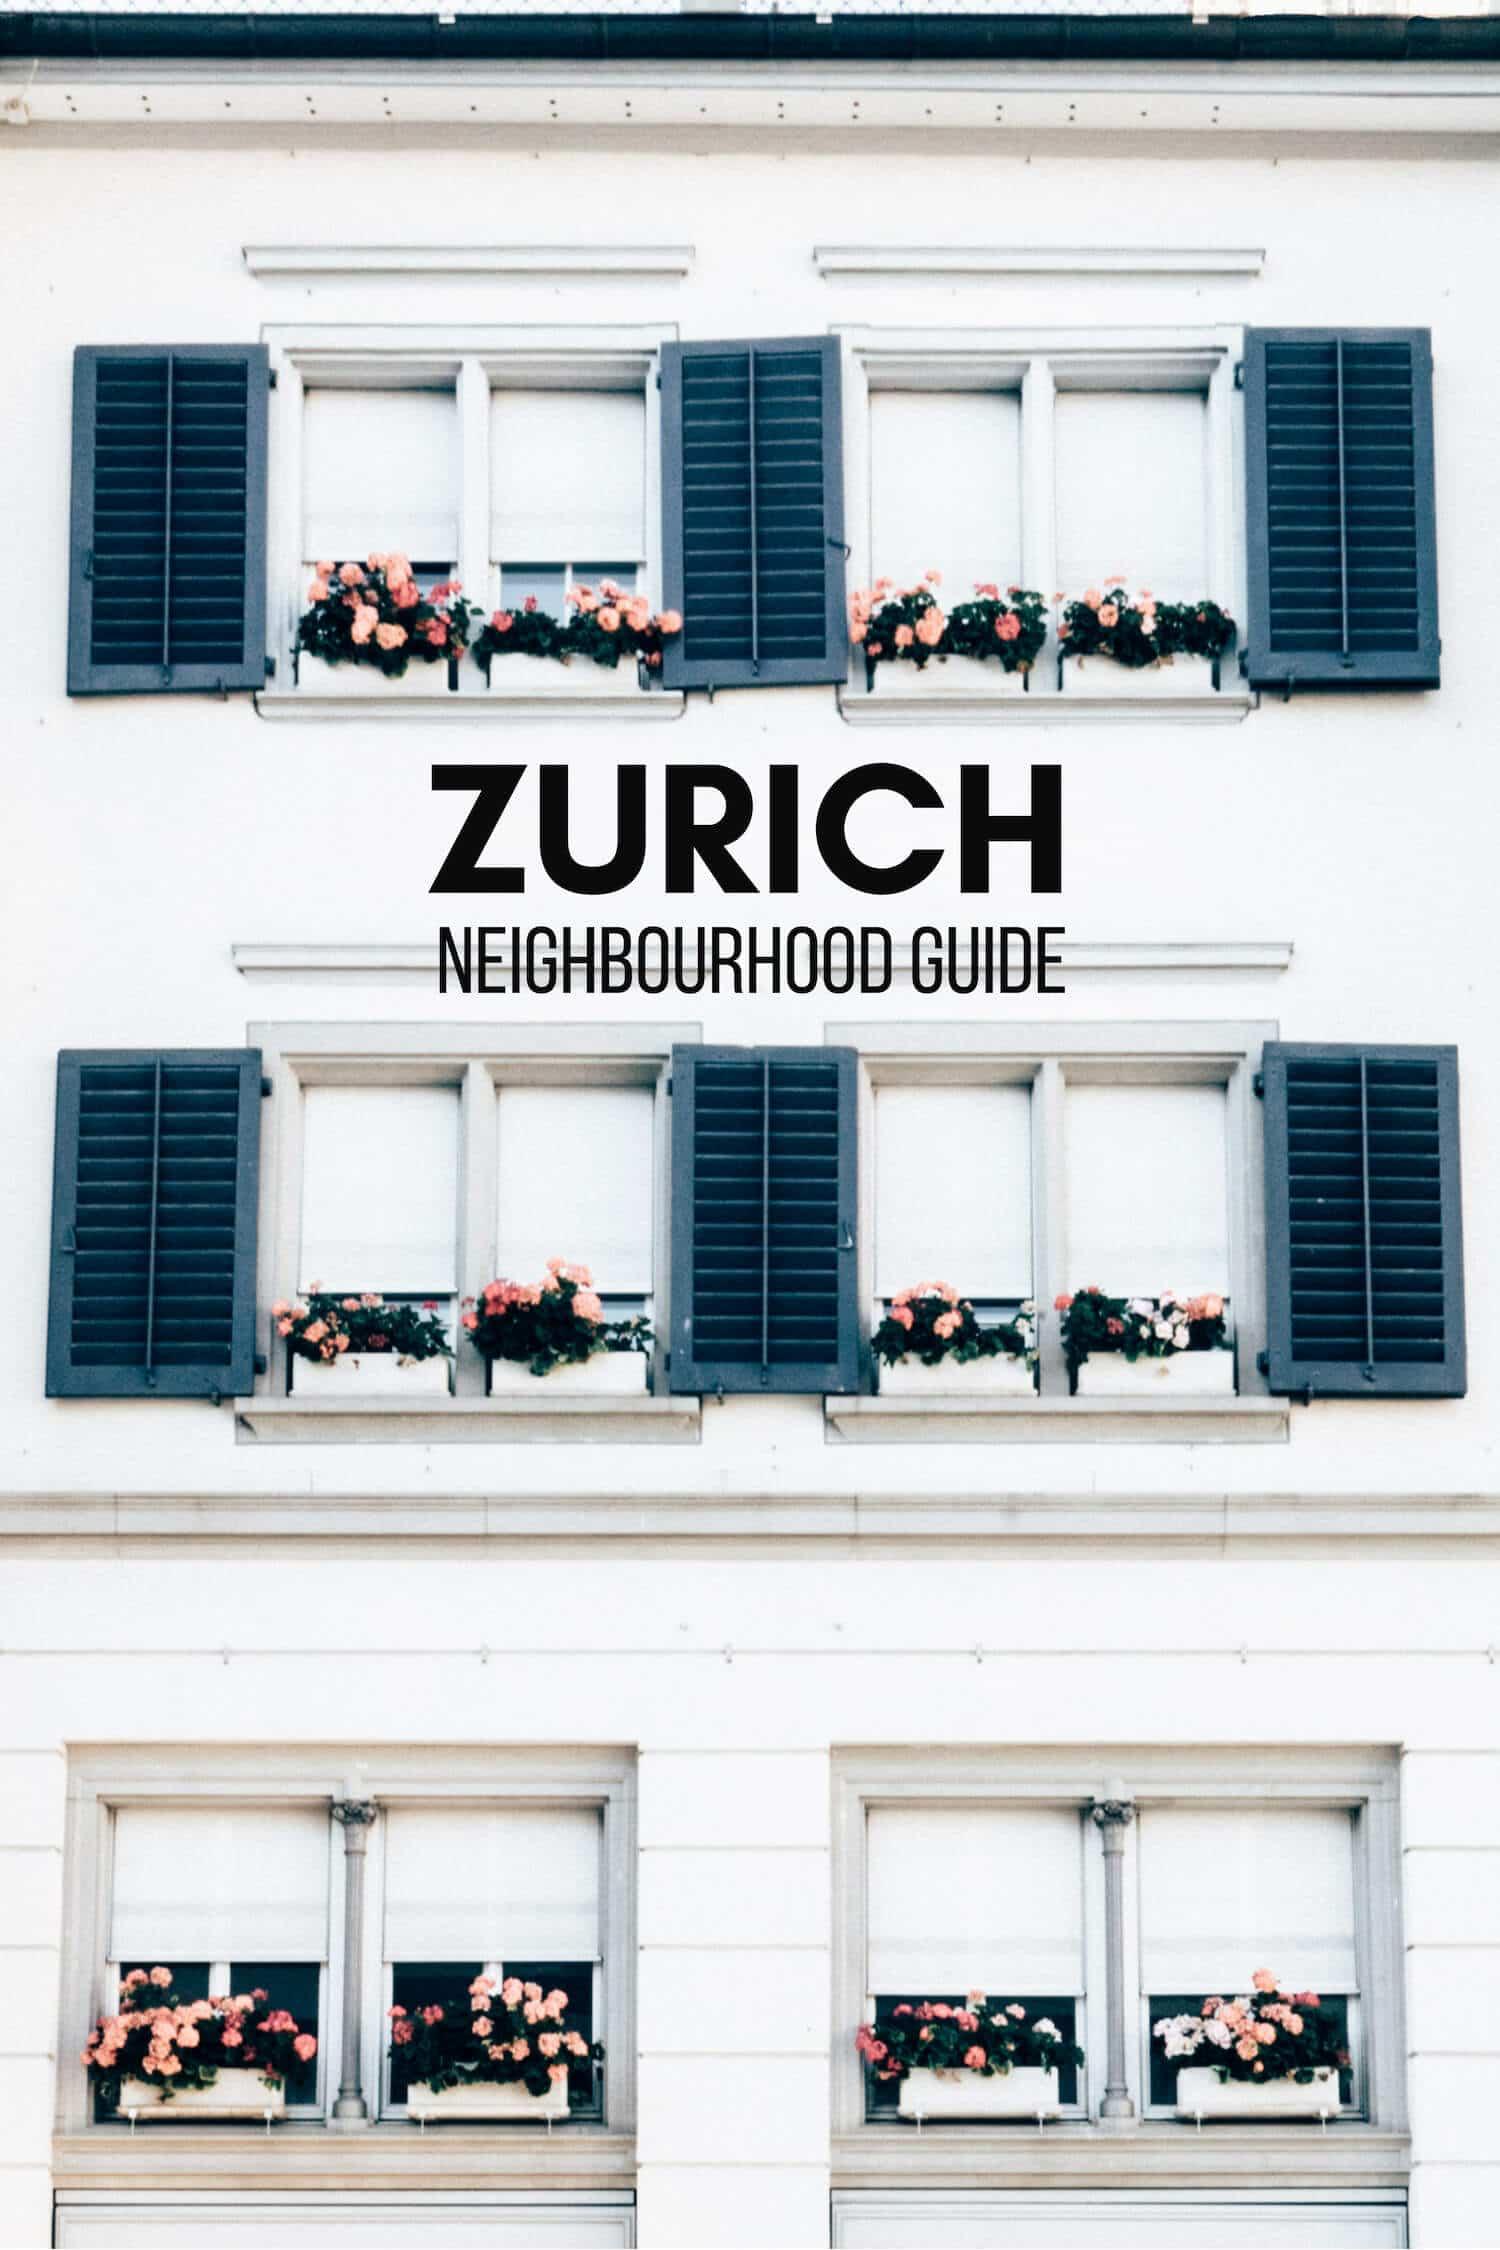 Zurich Neighbourhood Guide & Where to Stay